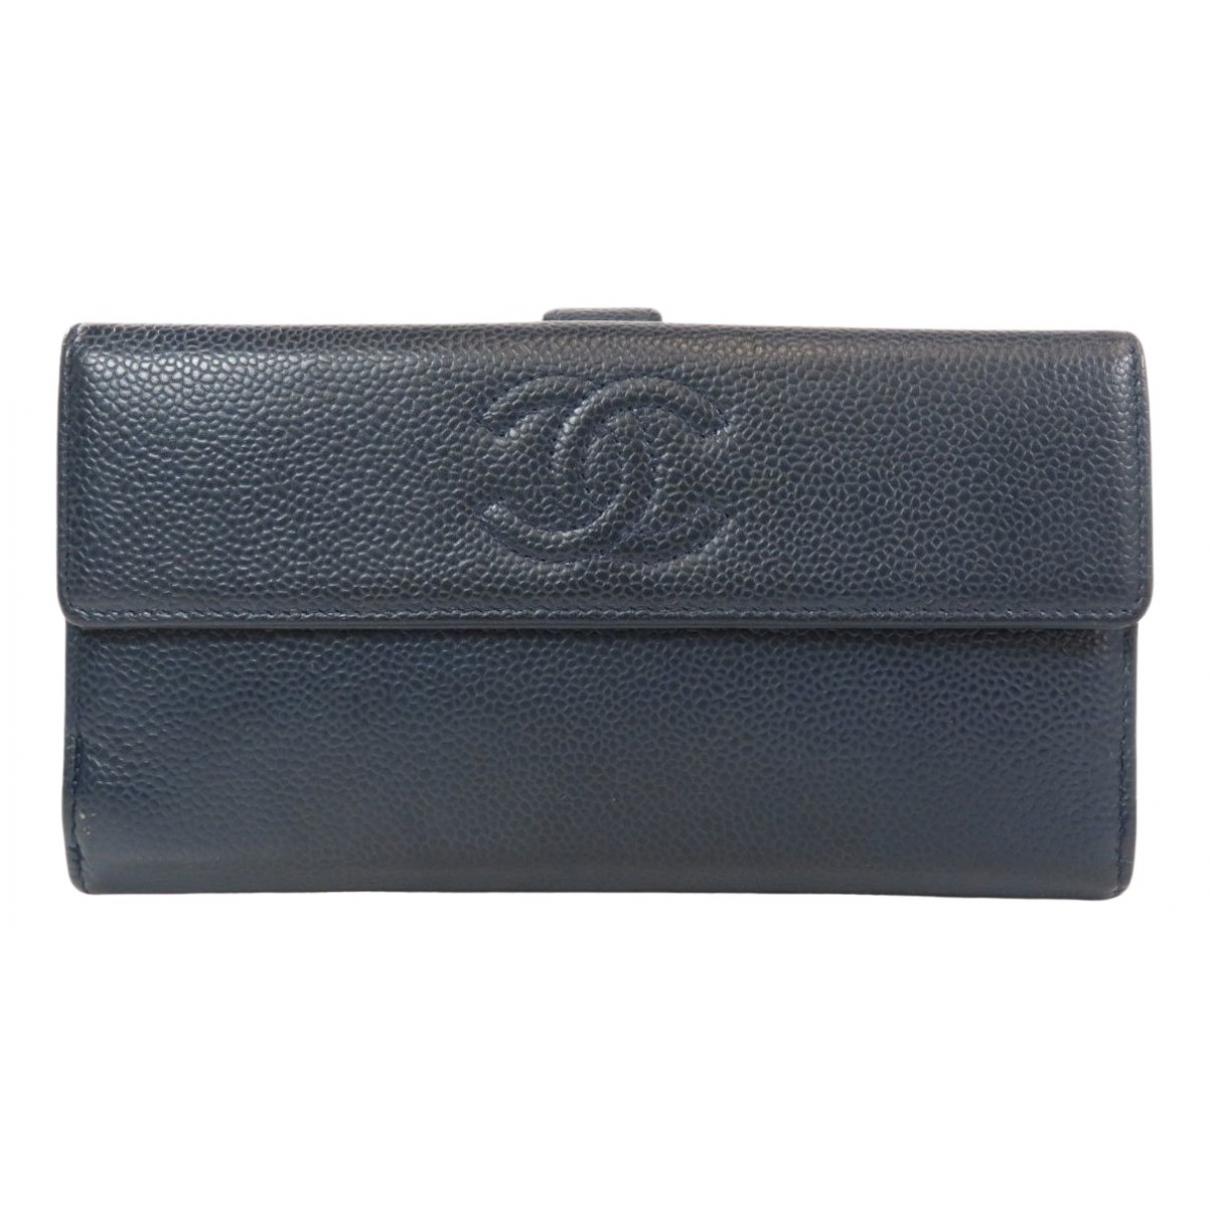 Chanel \N Portemonnaie in  Marine Leder